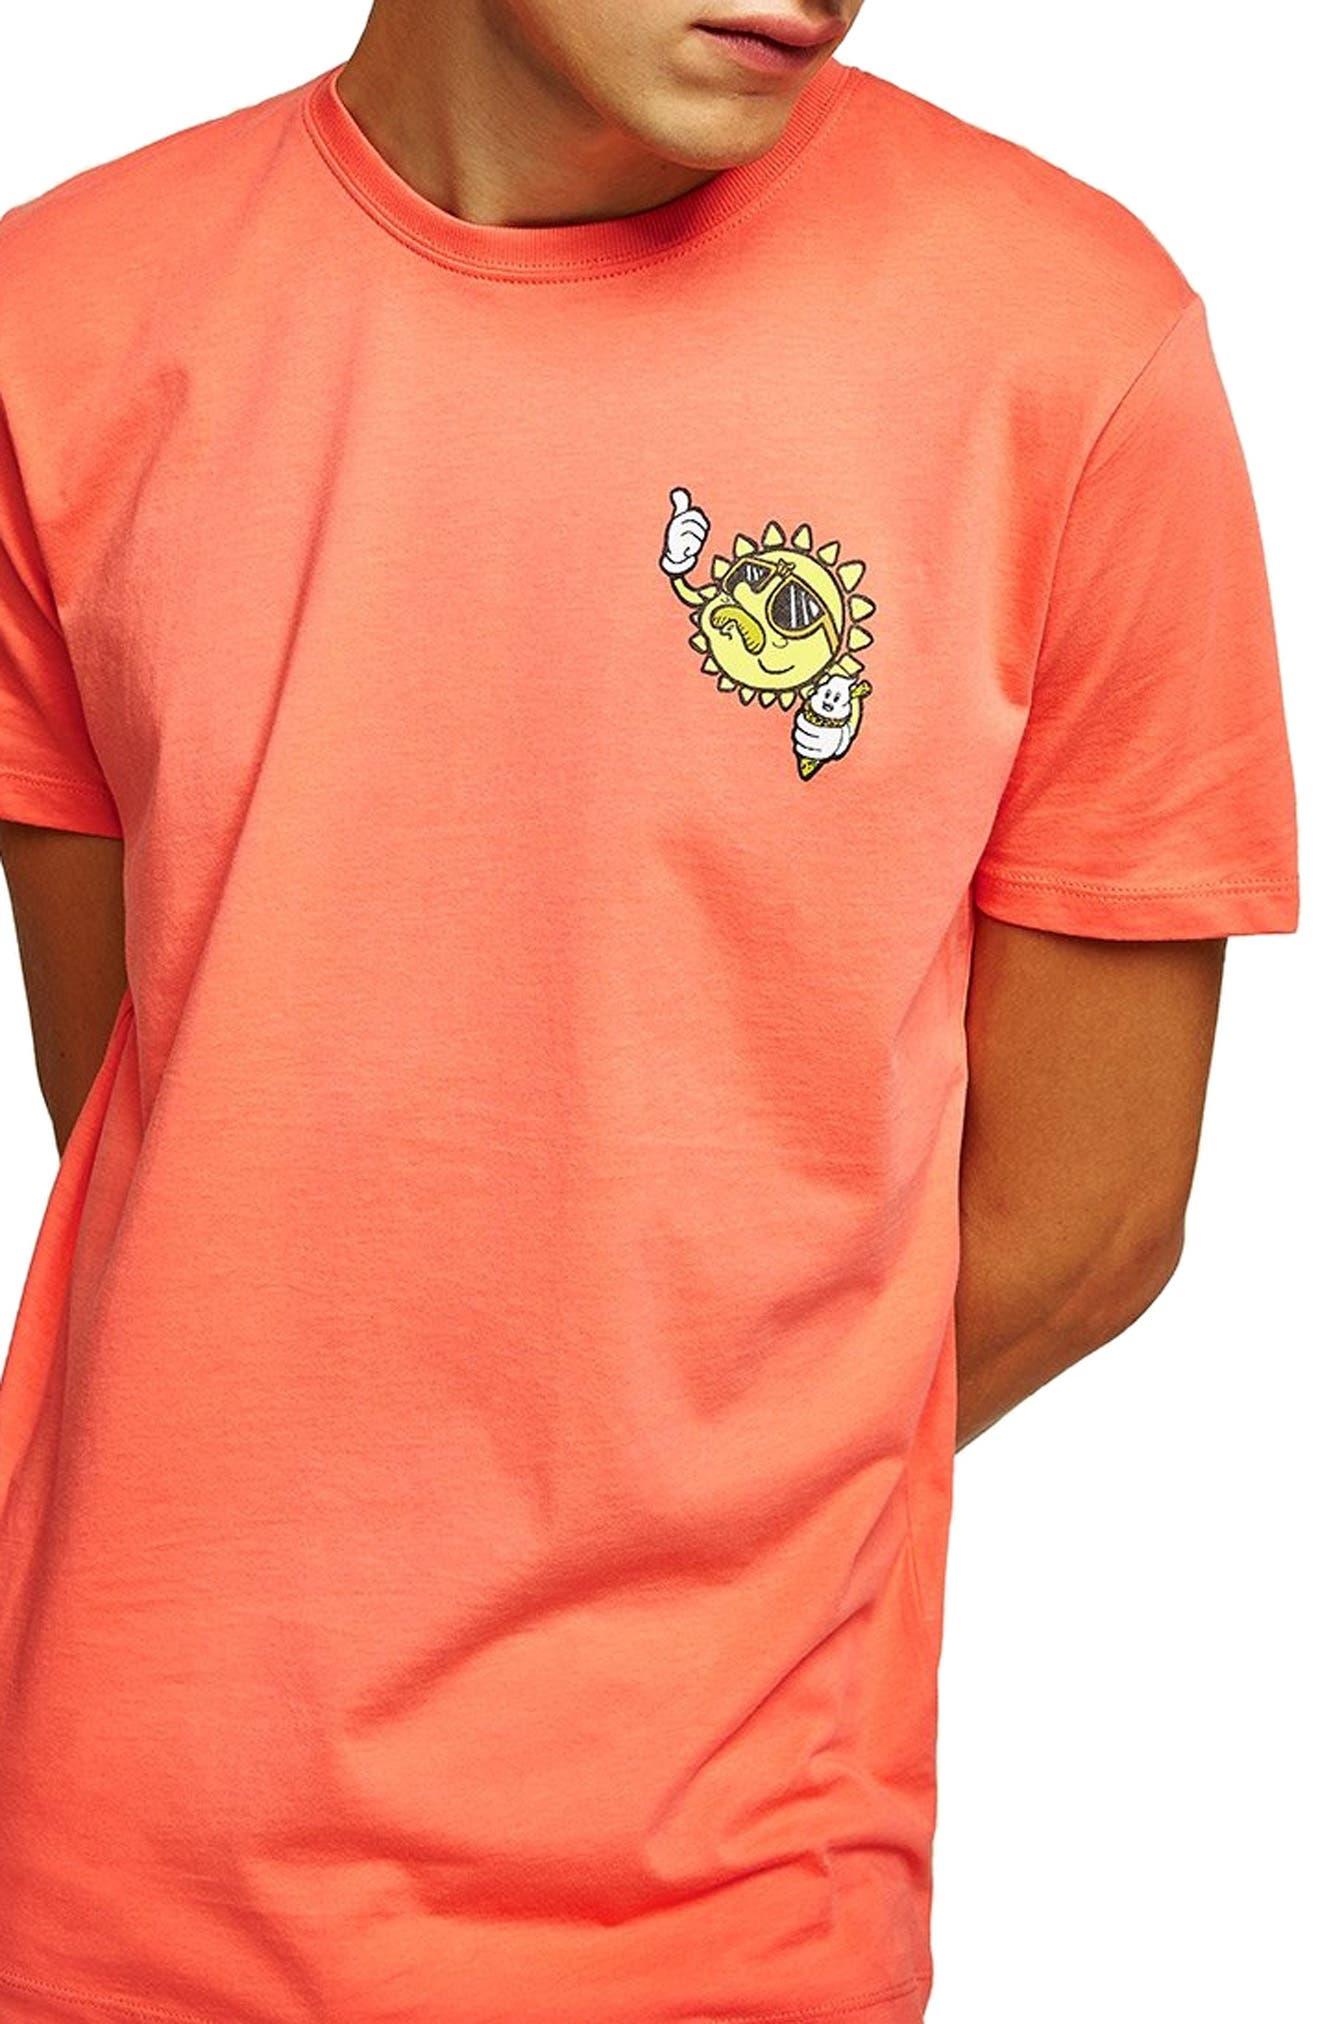 Sun T-Shirt,                             Main thumbnail 1, color,                             PINK